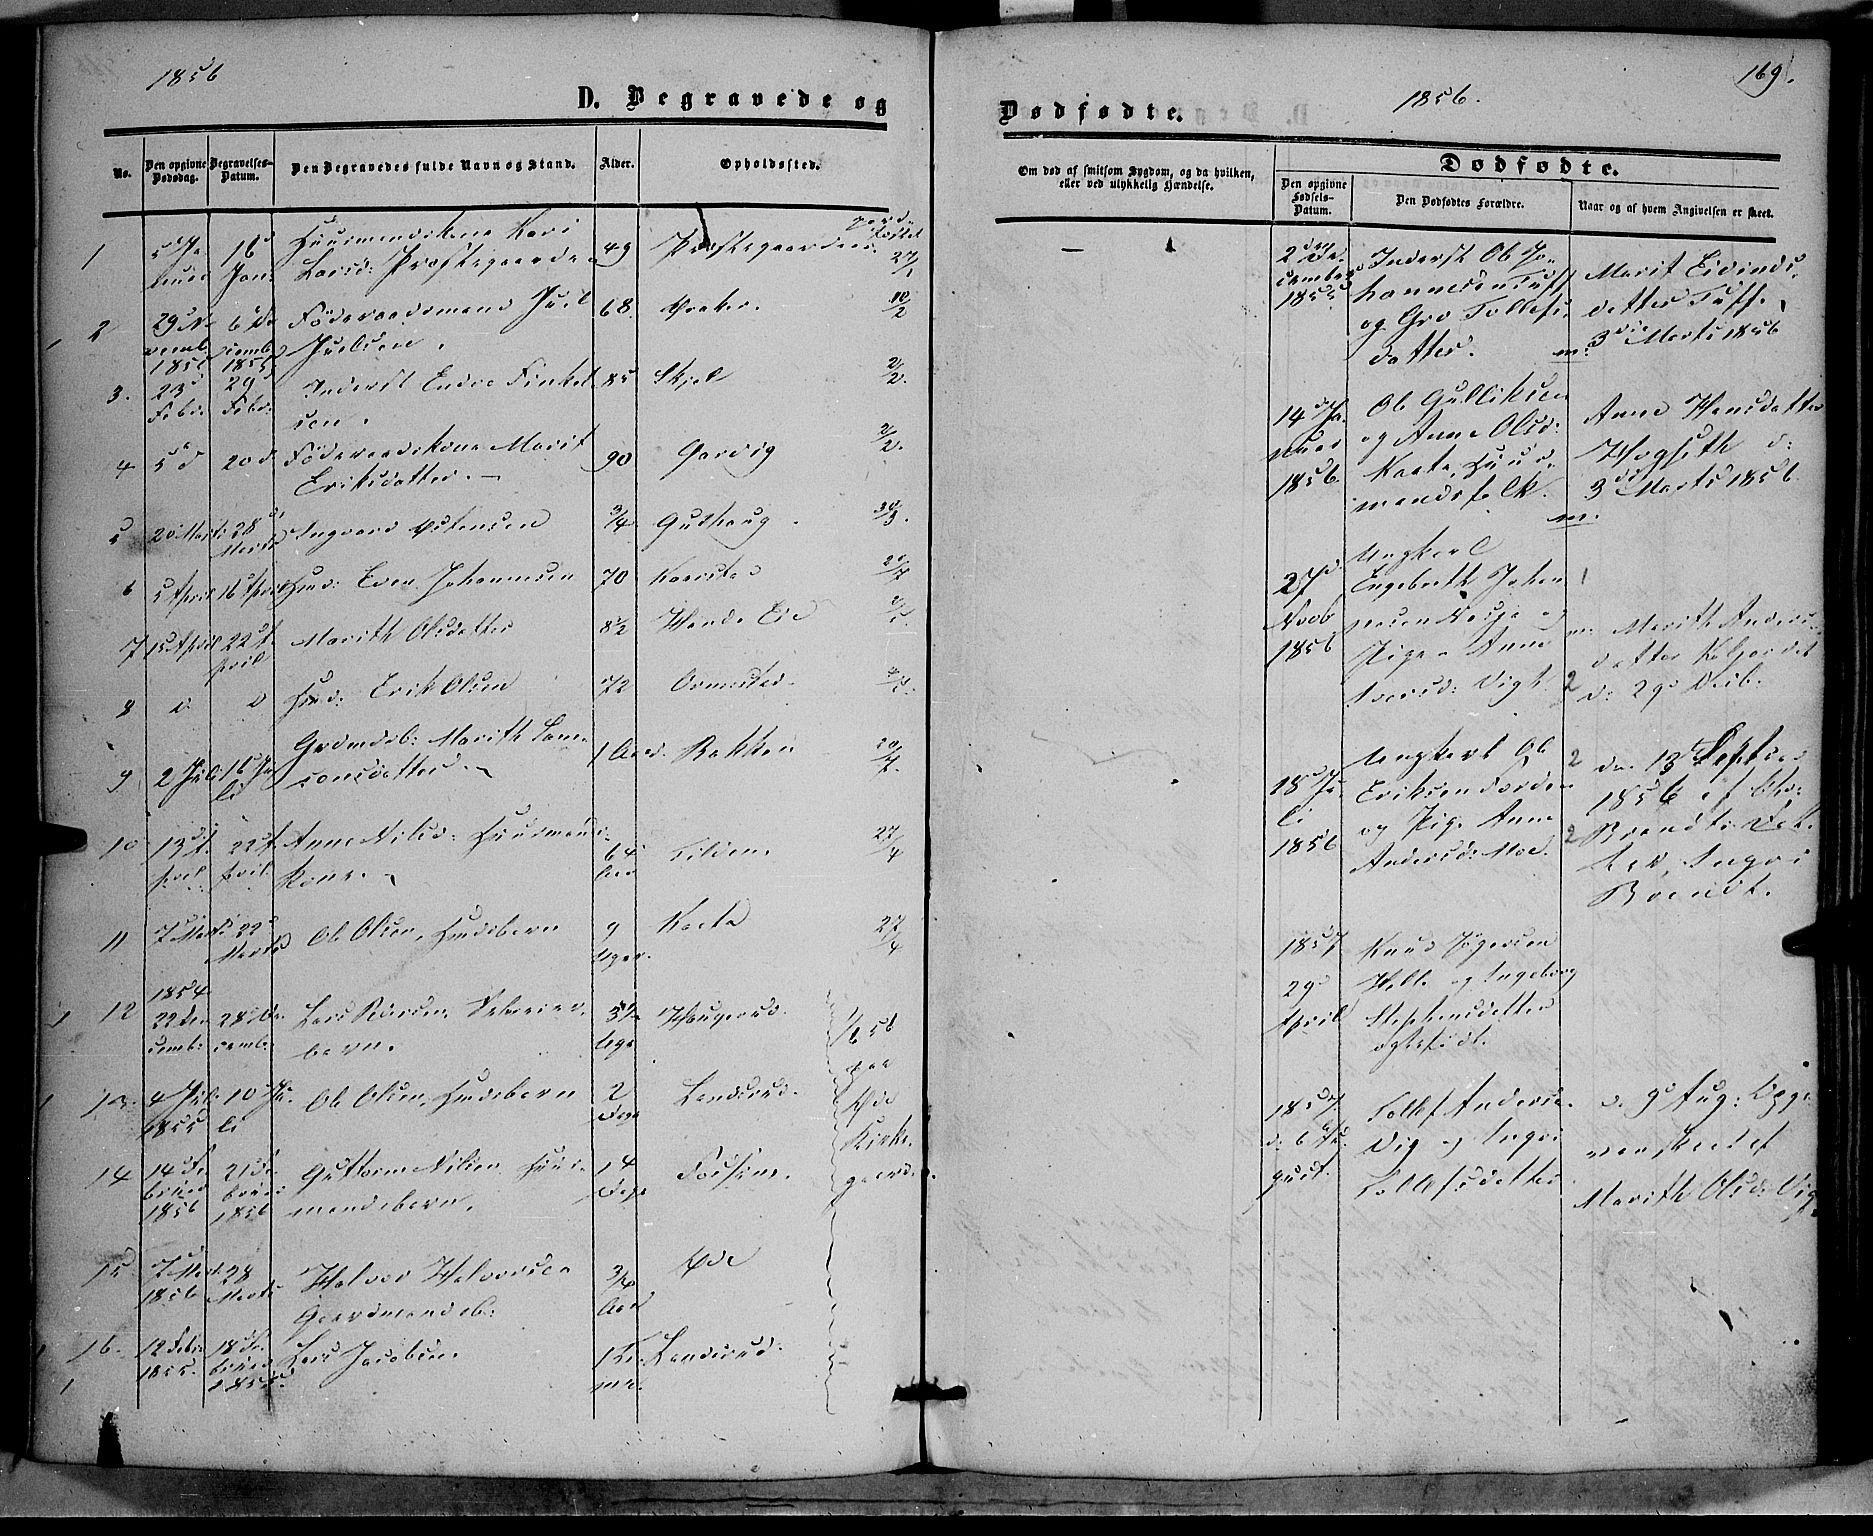 SAH, Vestre Slidre prestekontor, Ministerialbok nr. 2, 1856-1864, s. 169